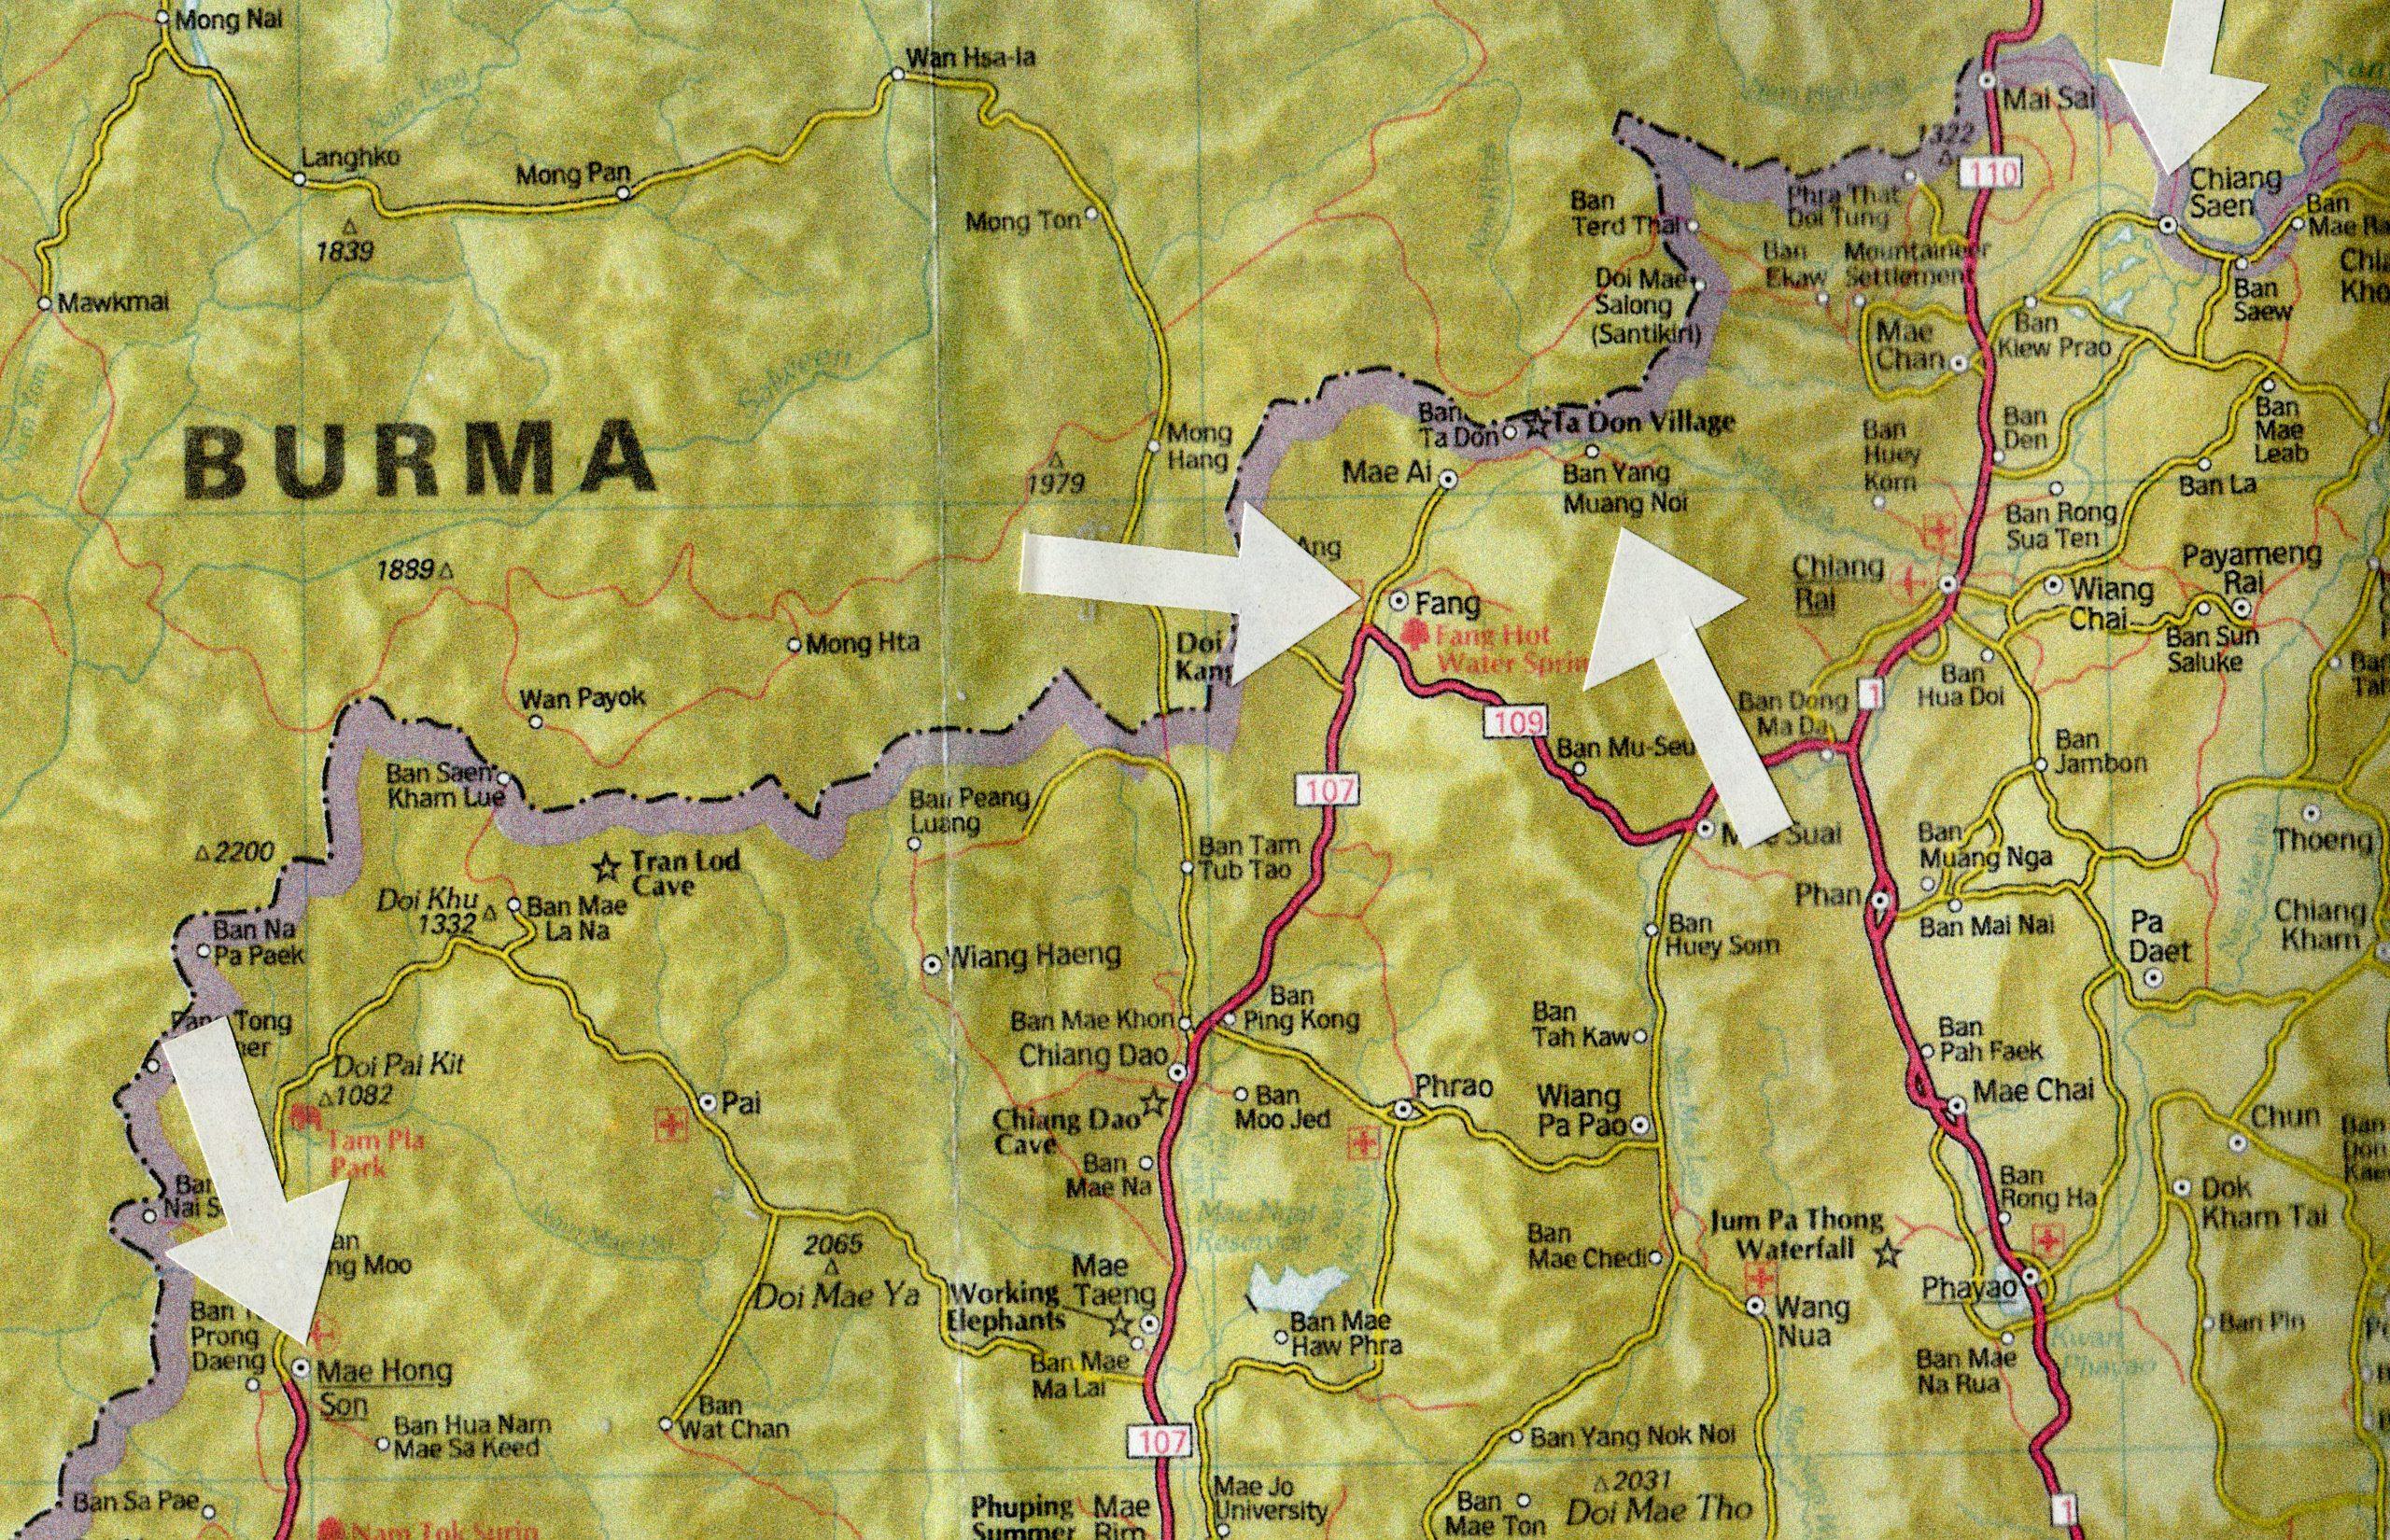 PGS 41,2 (2020) Tafel 27 Karte der burmesisch / thailändischen Grenzregion mit den Ortschaften Mae Hong Son, Fang und Ban Yang Muang Noi.